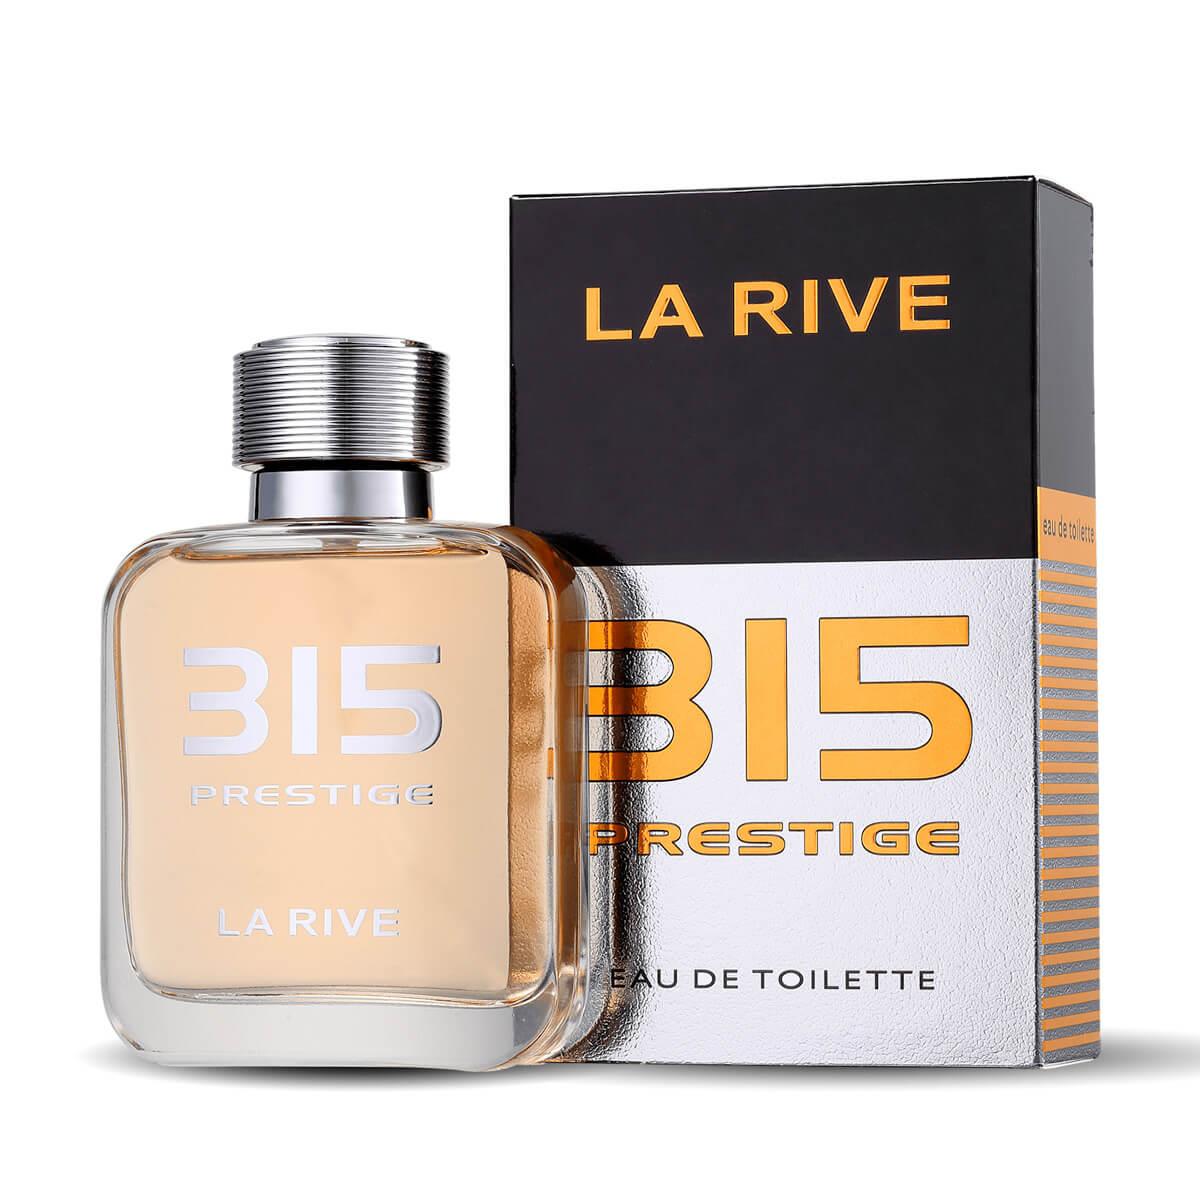 Kit 3 Perfumes Importados Masculinos 315 Prestige La Rive